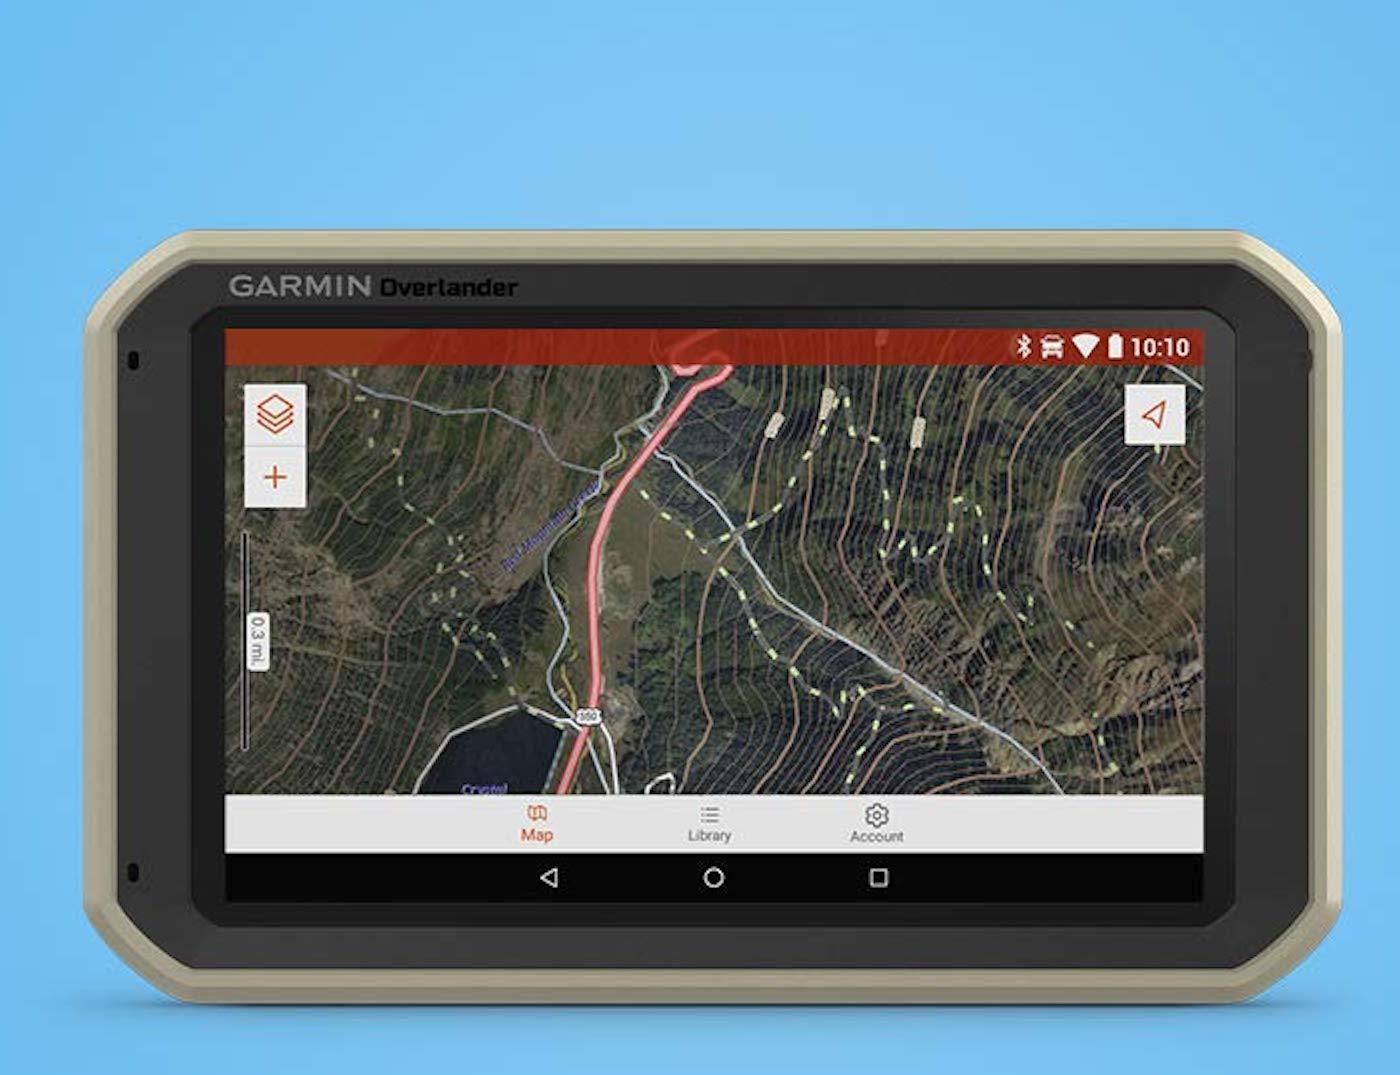 Garmin Overlander Off Road GPS